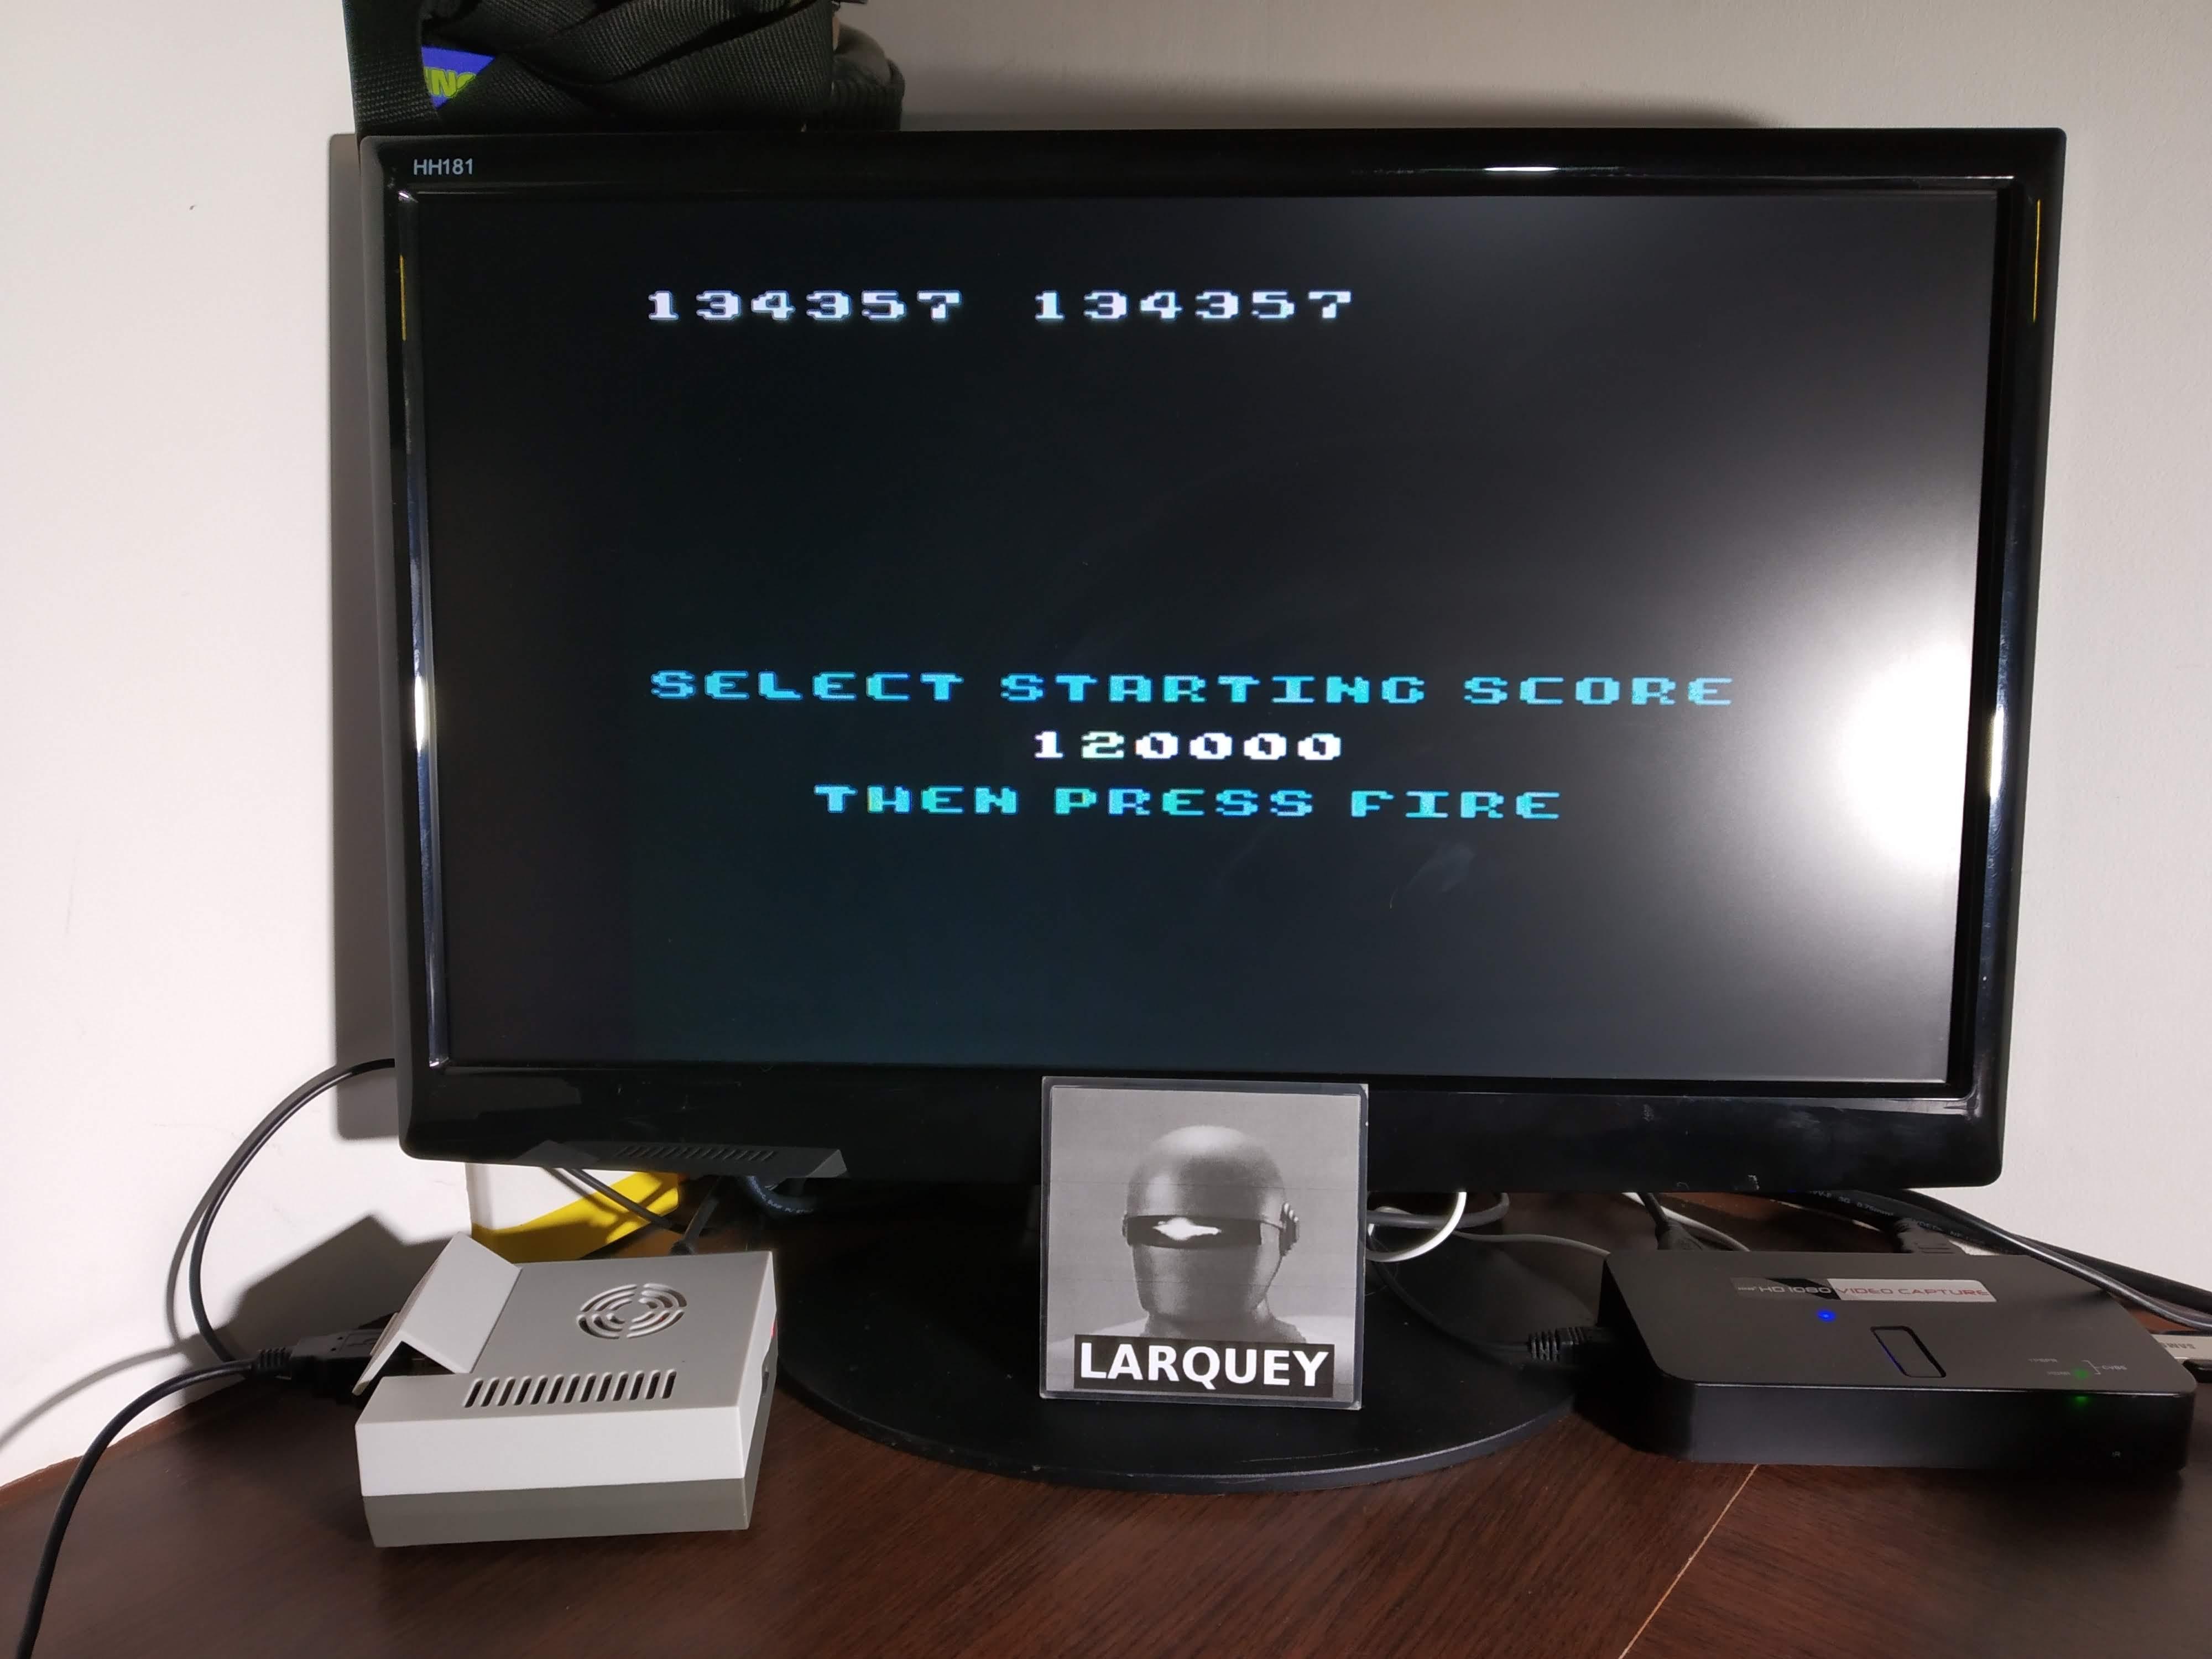 Larquey: Millipede (Atari 5200 Emulated) 134,357 points on 2019-11-09 13:57:45